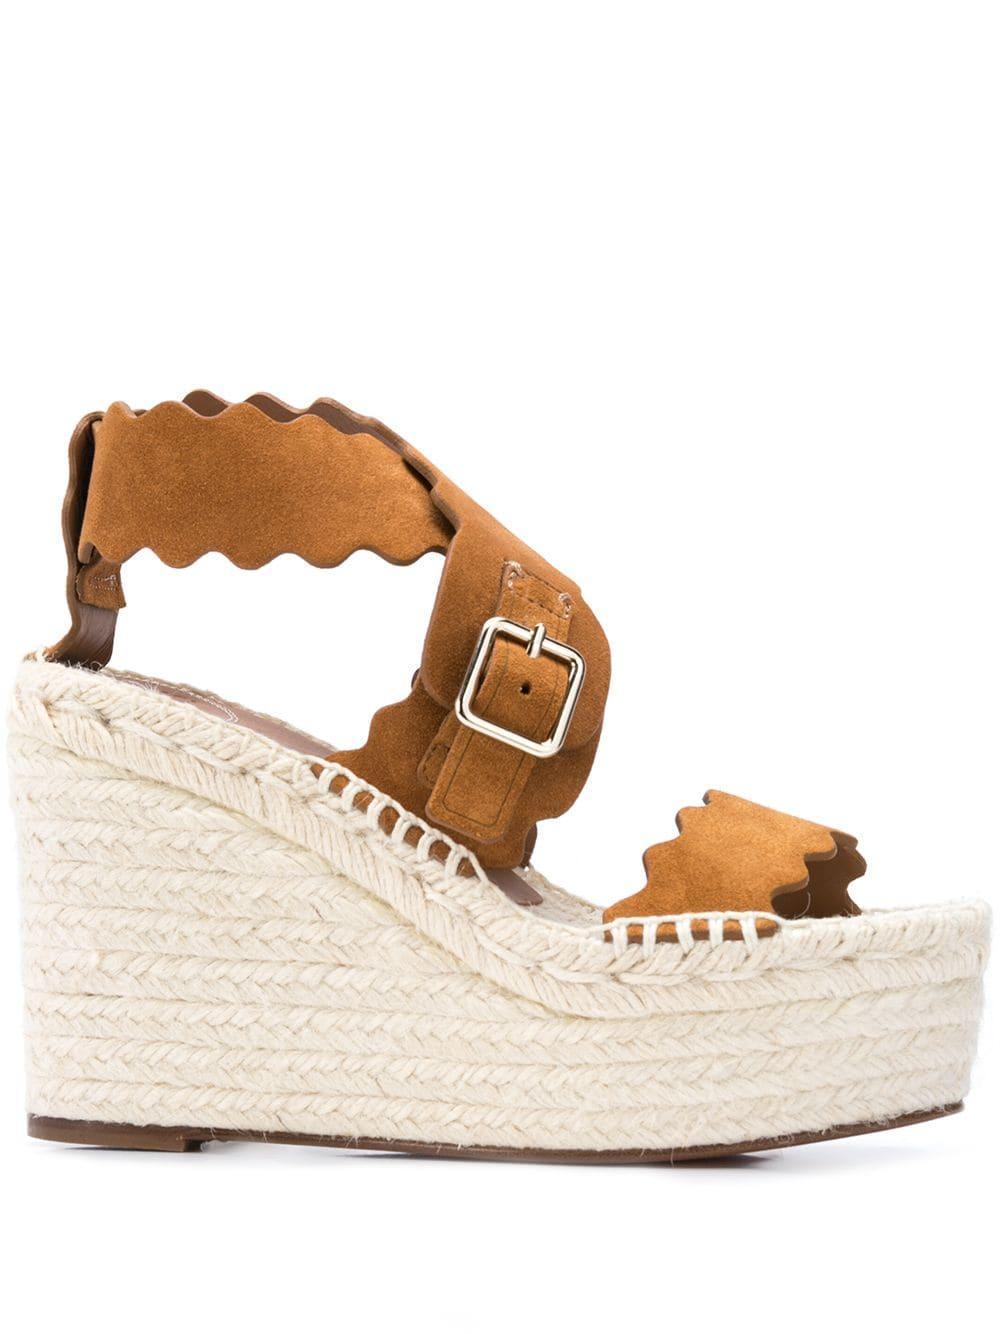 Lauren Suede 50mm Platform Espadrille Sandal Item # CHC19U19318243